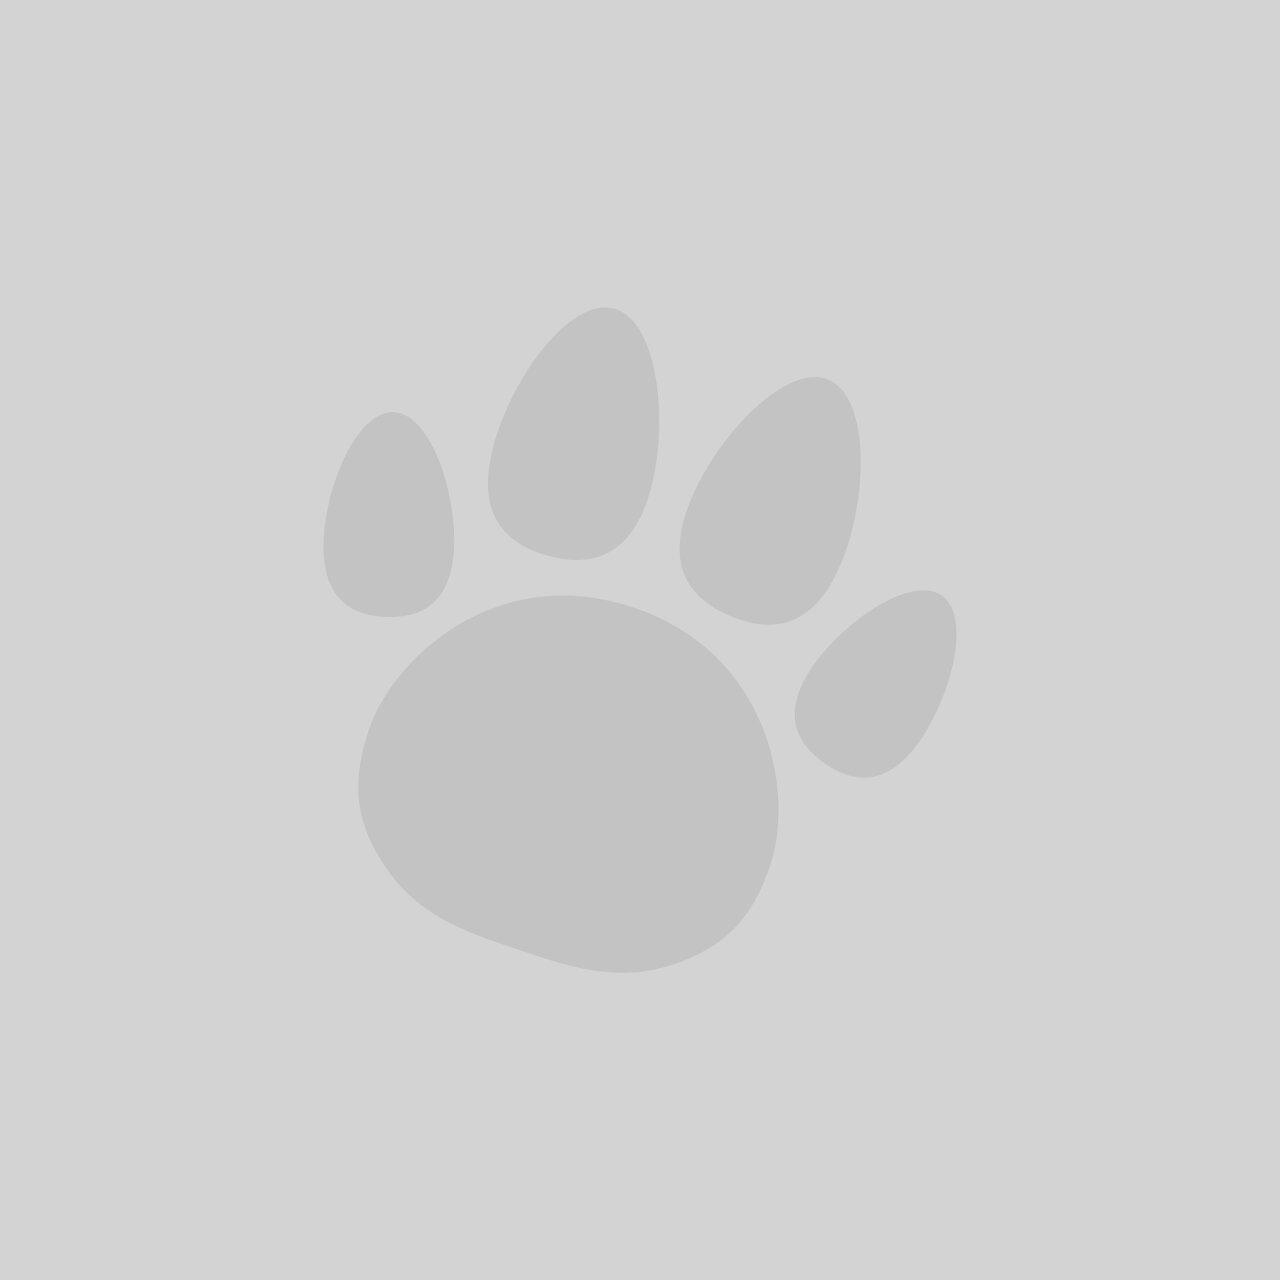 Flexi Classic Retractable Tape Small Dog Lead 5m - Red